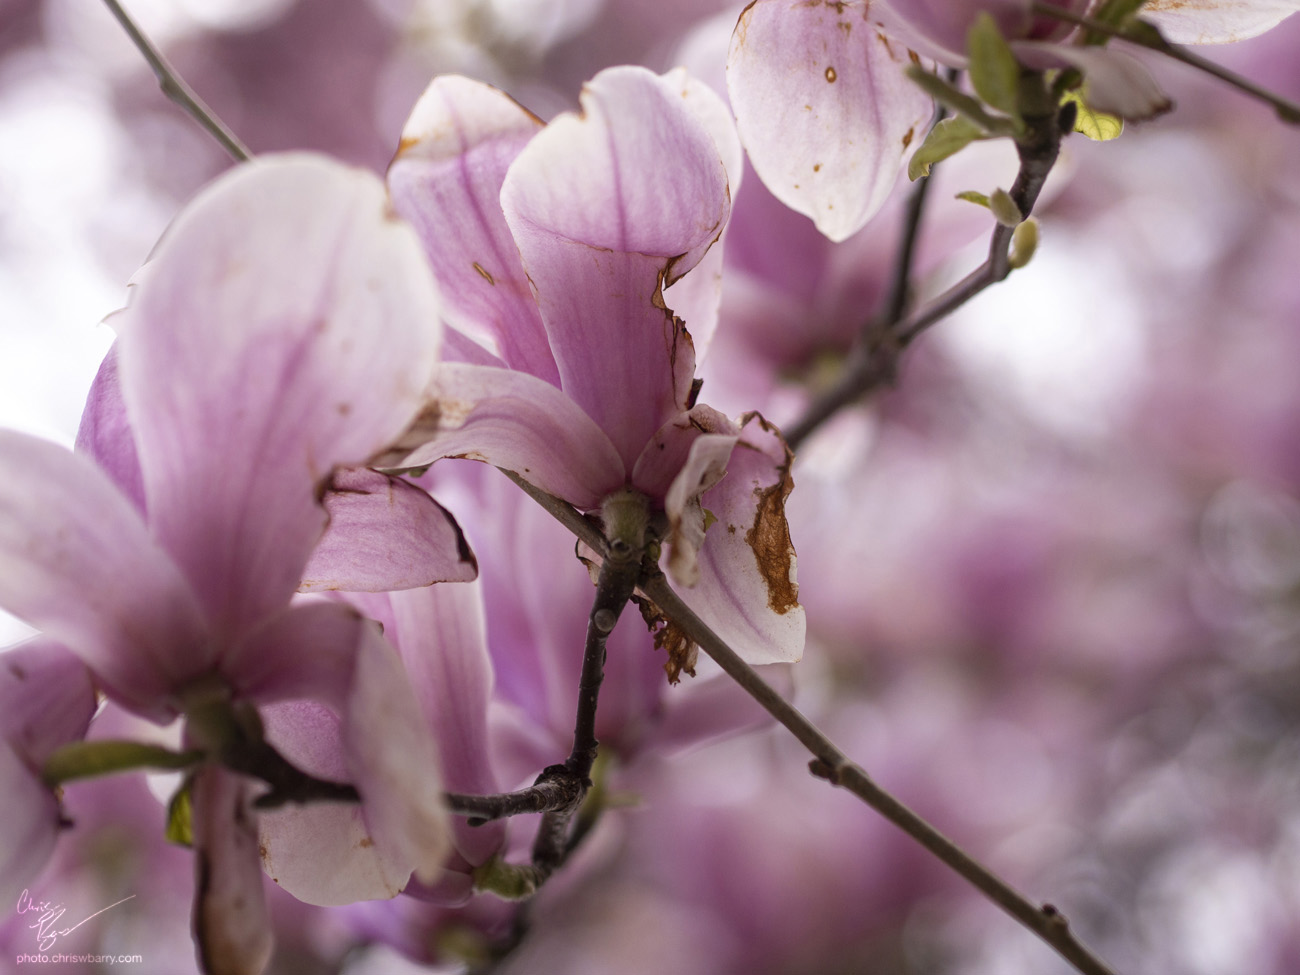 4-29-18: Just a standard pink magnolia